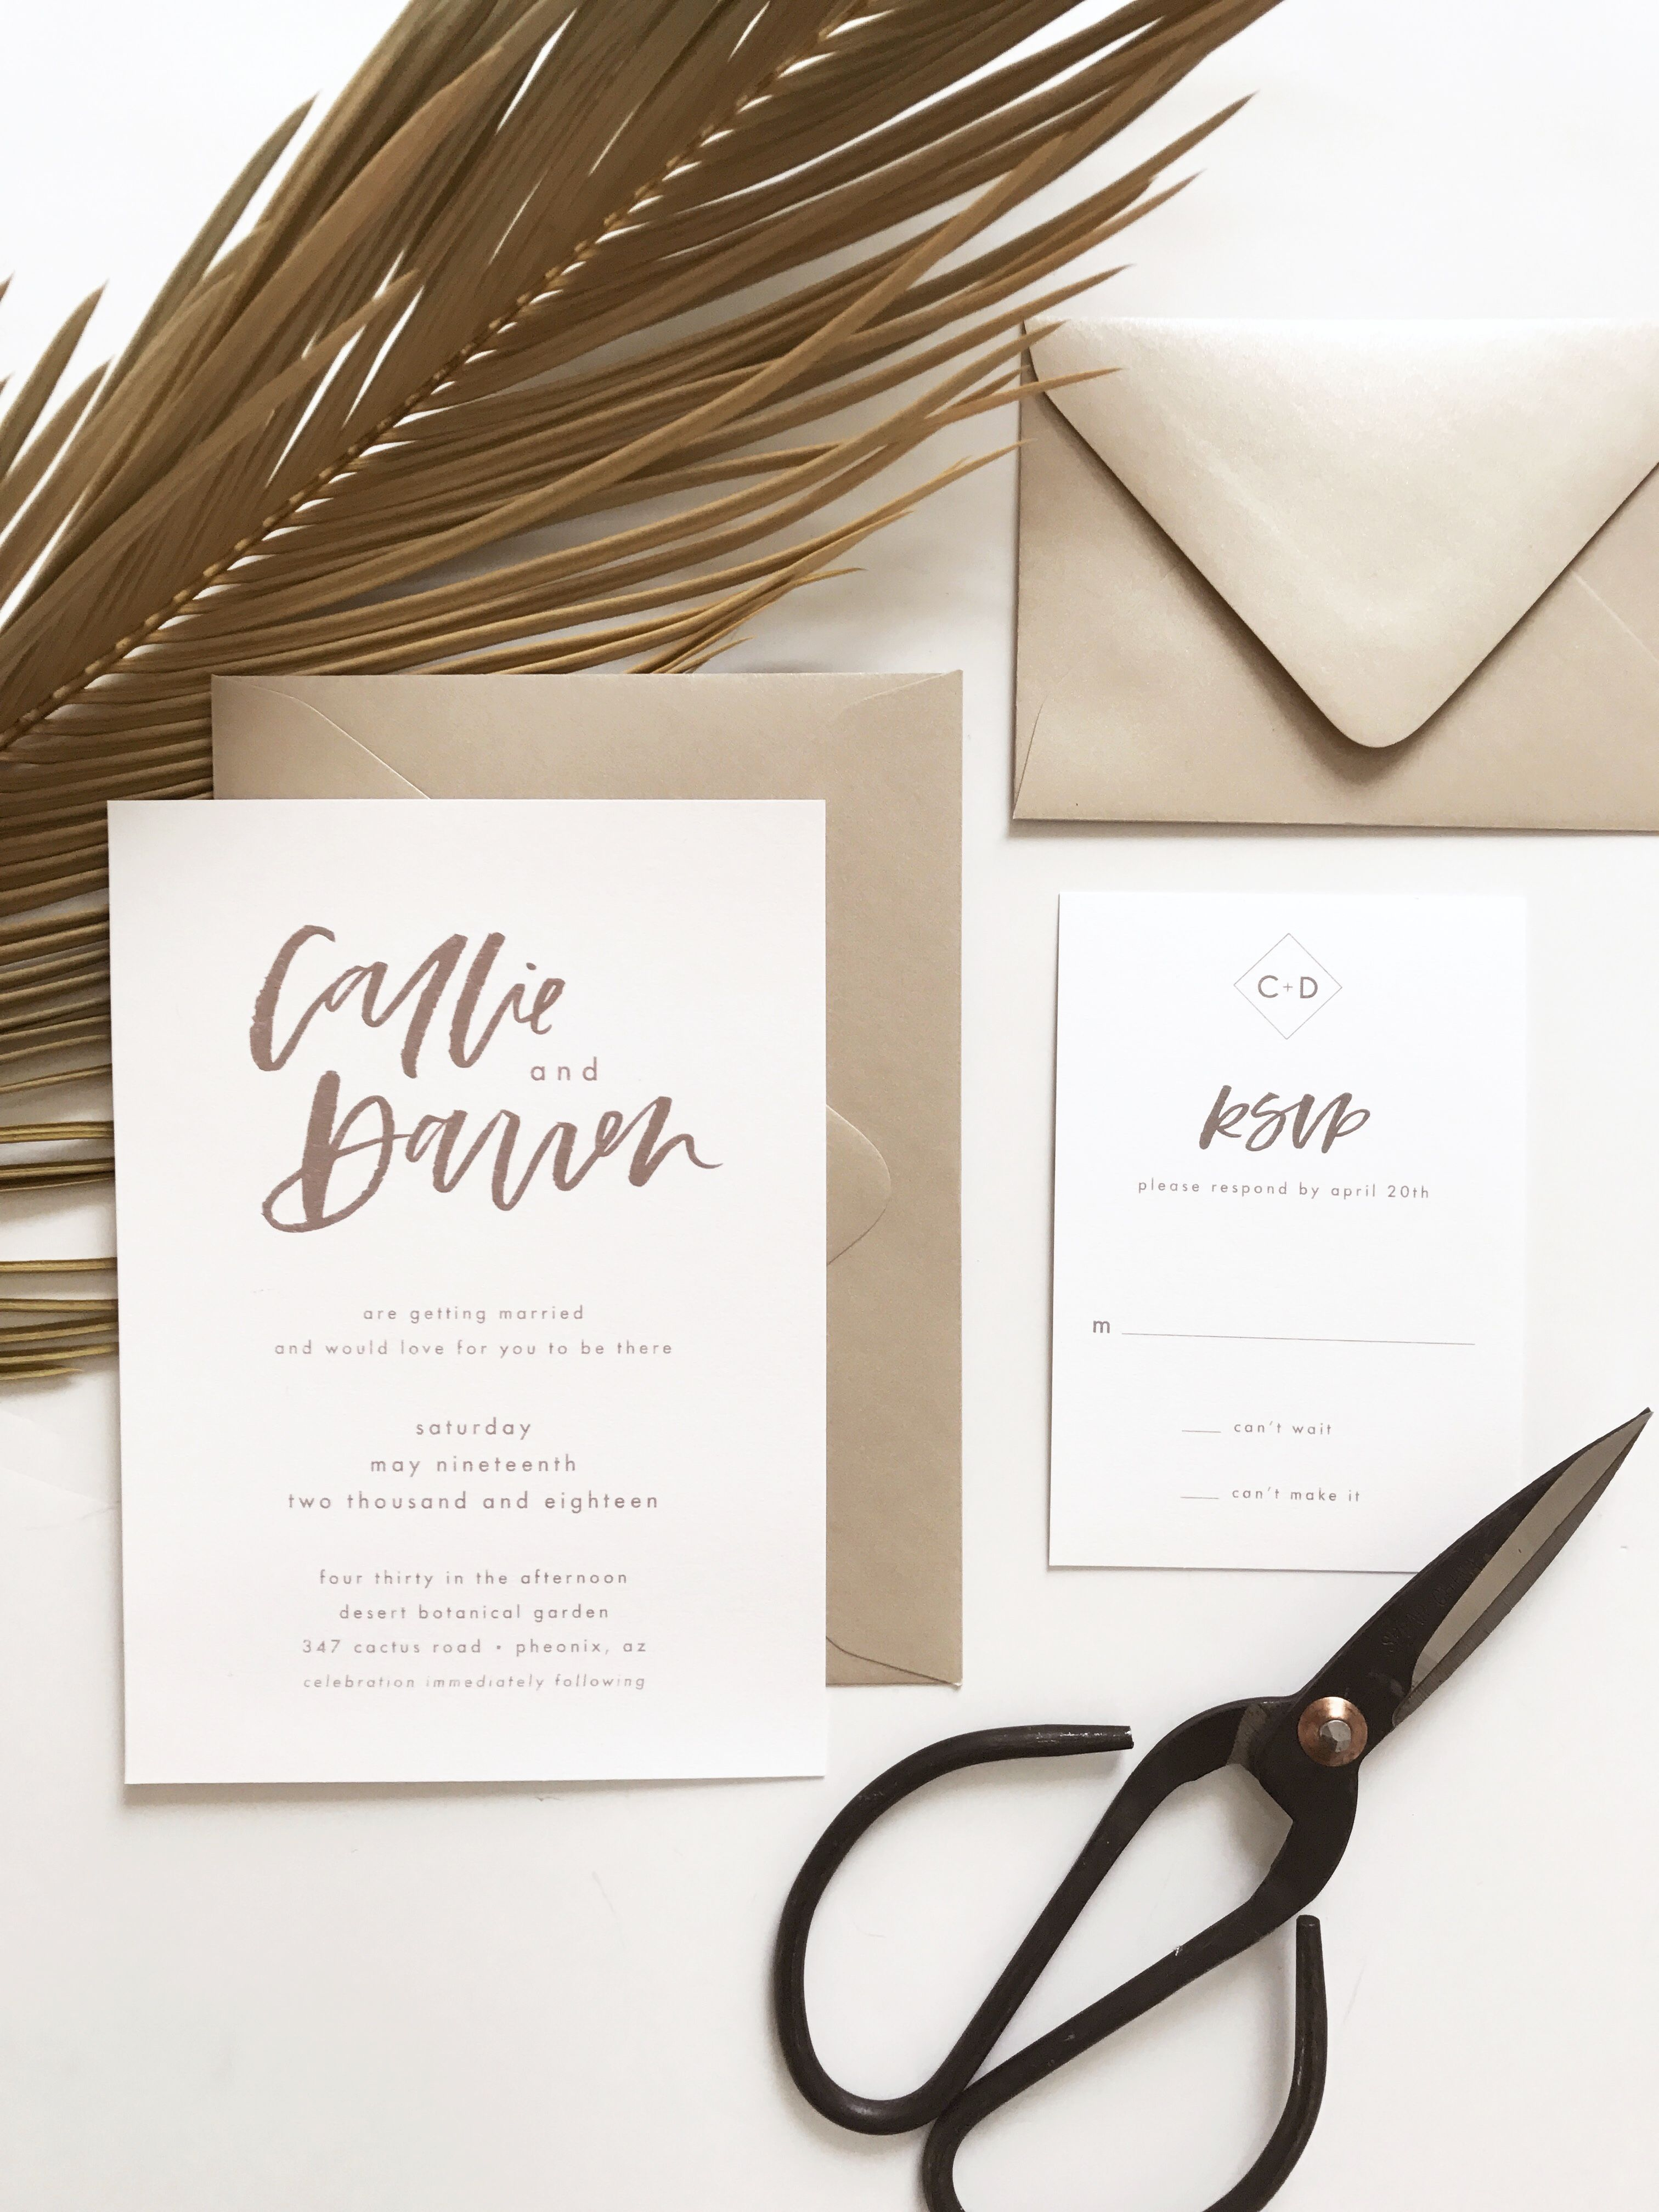 Simple Modern Calligraphy Wedding Invitation Minimalist W Minimalist Wedding Invitations Calligraphy Wedding Invitation Modern Calligraphy Wedding Invitation